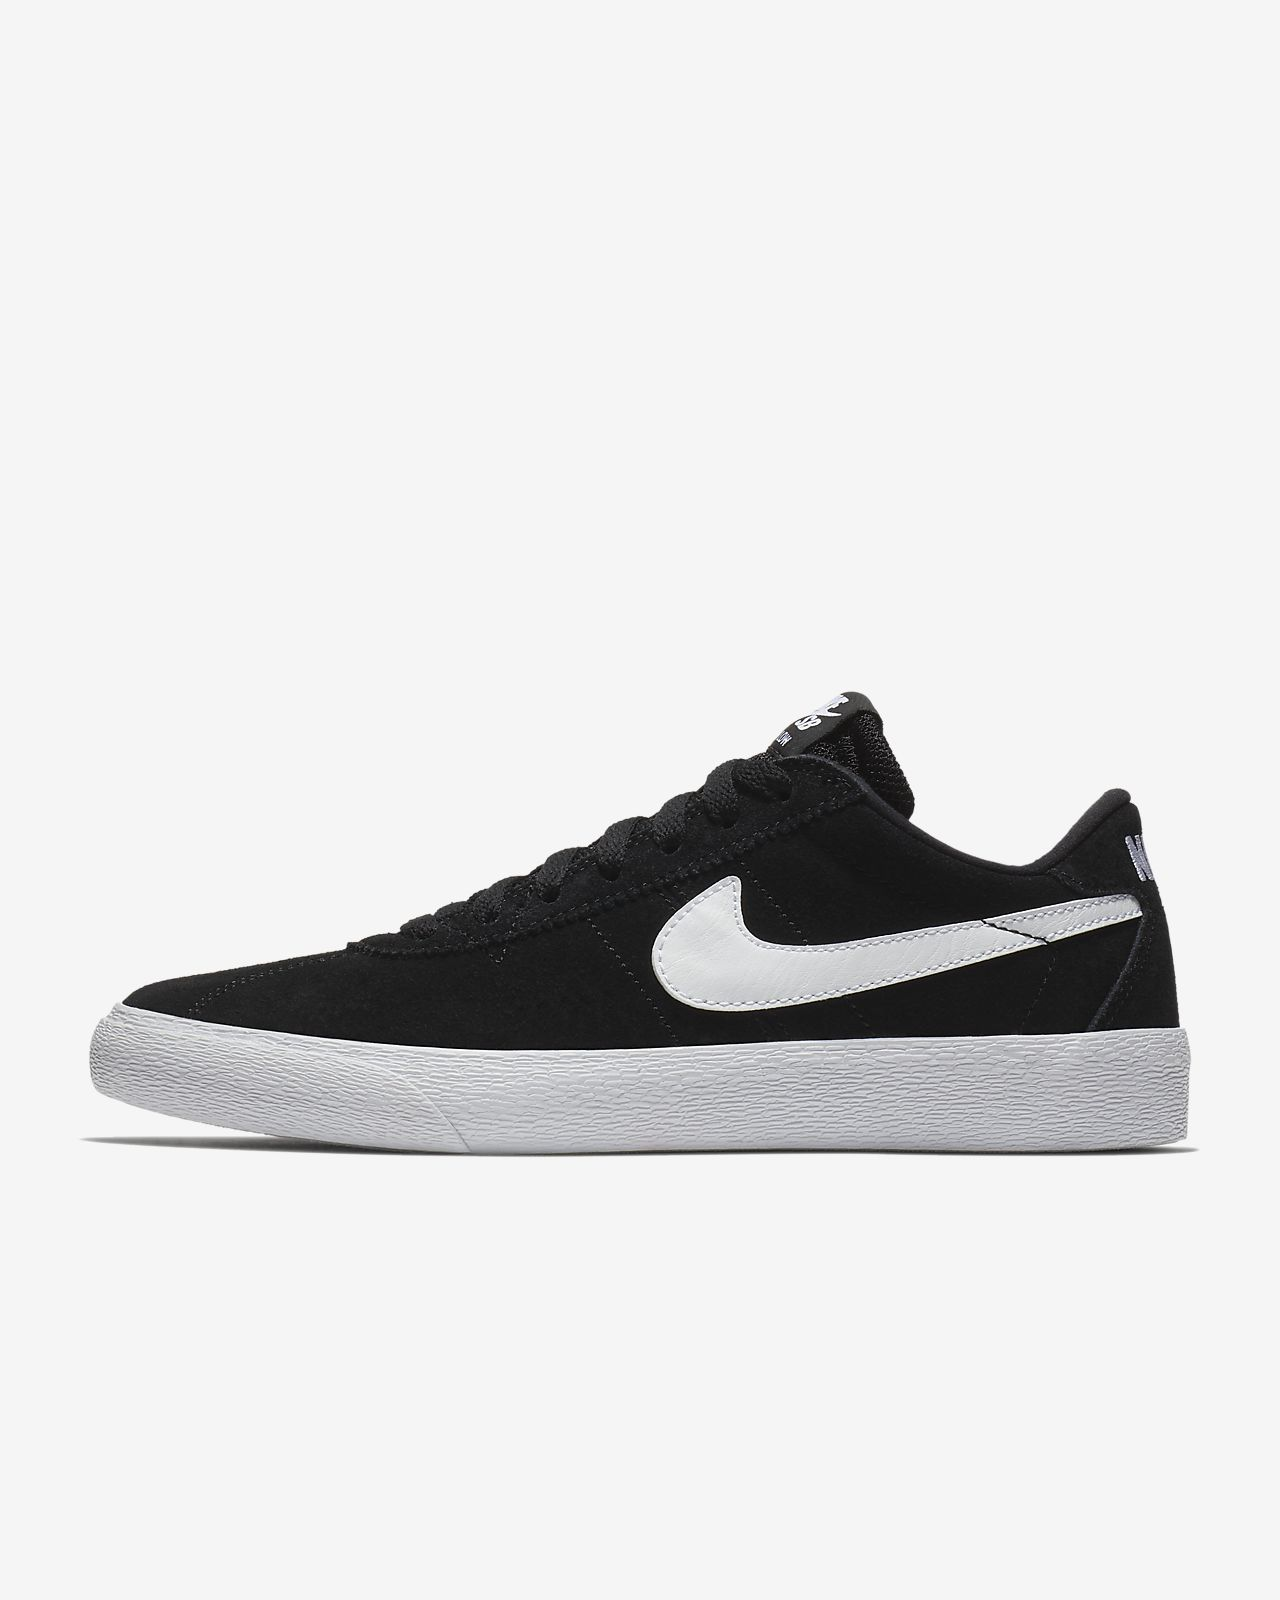 size 40 9880f 83109 ... Calzado de skateboarding para mujer Nike SB Zoom Bruin Low